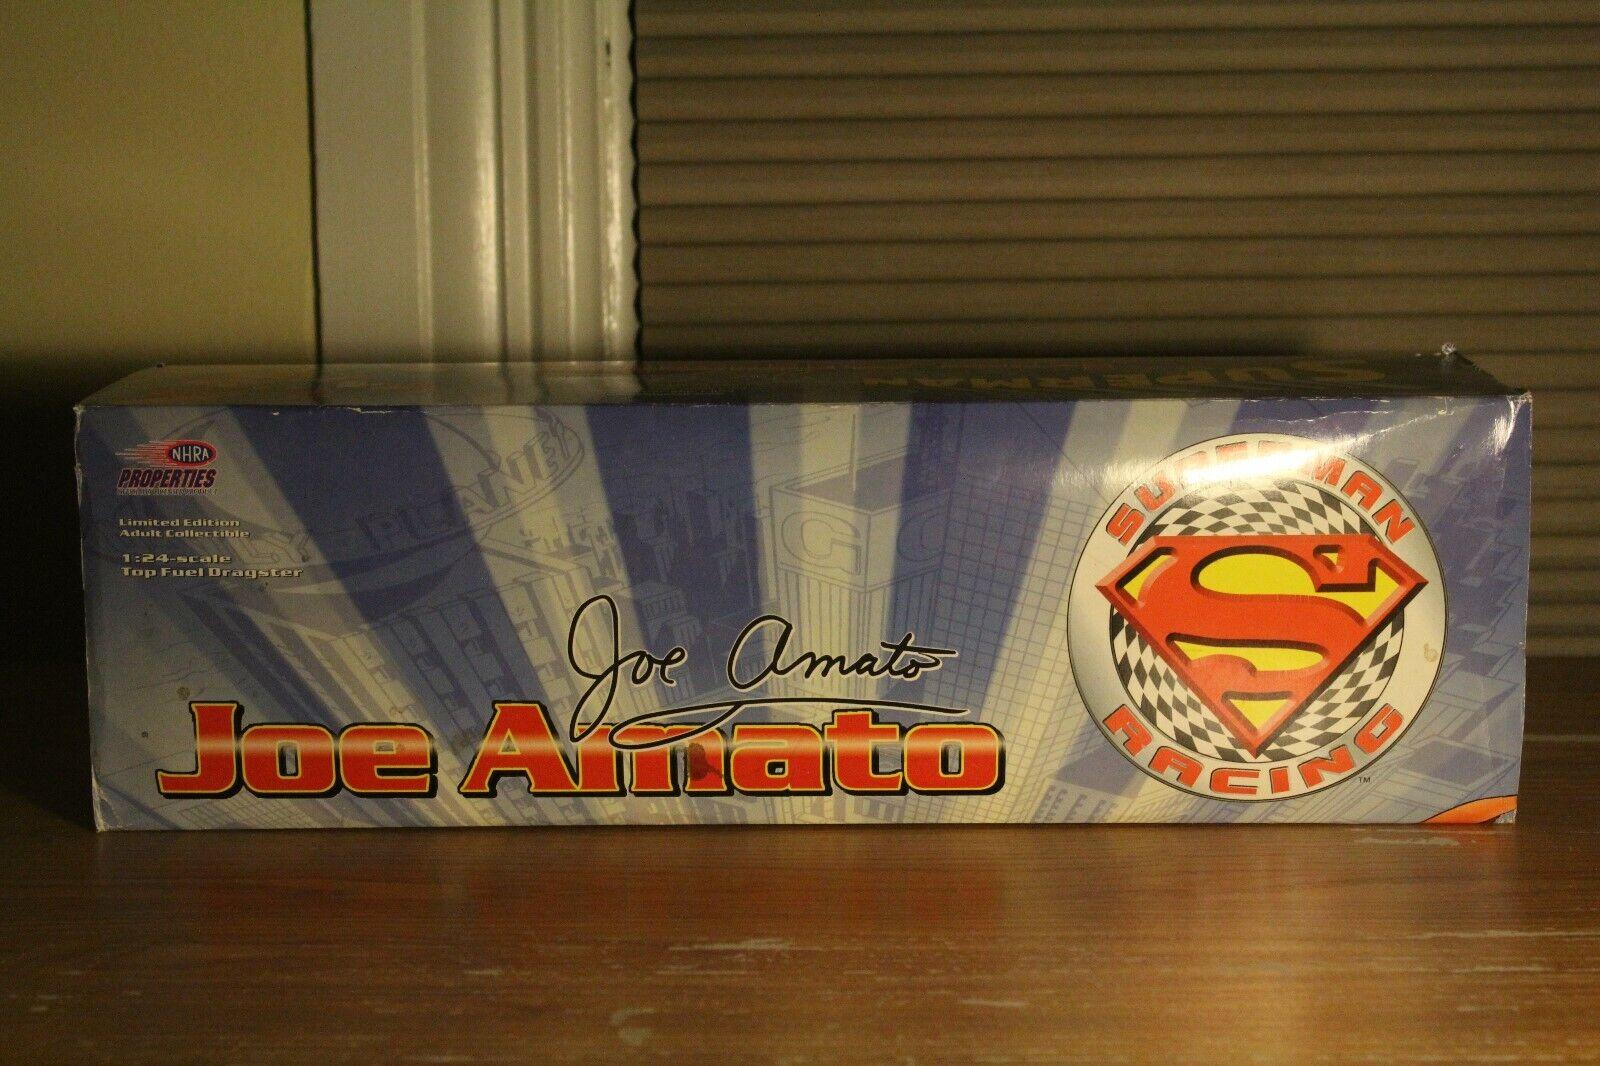 Joe Amato Superman Racing 1 24 Top Fuel Dragster